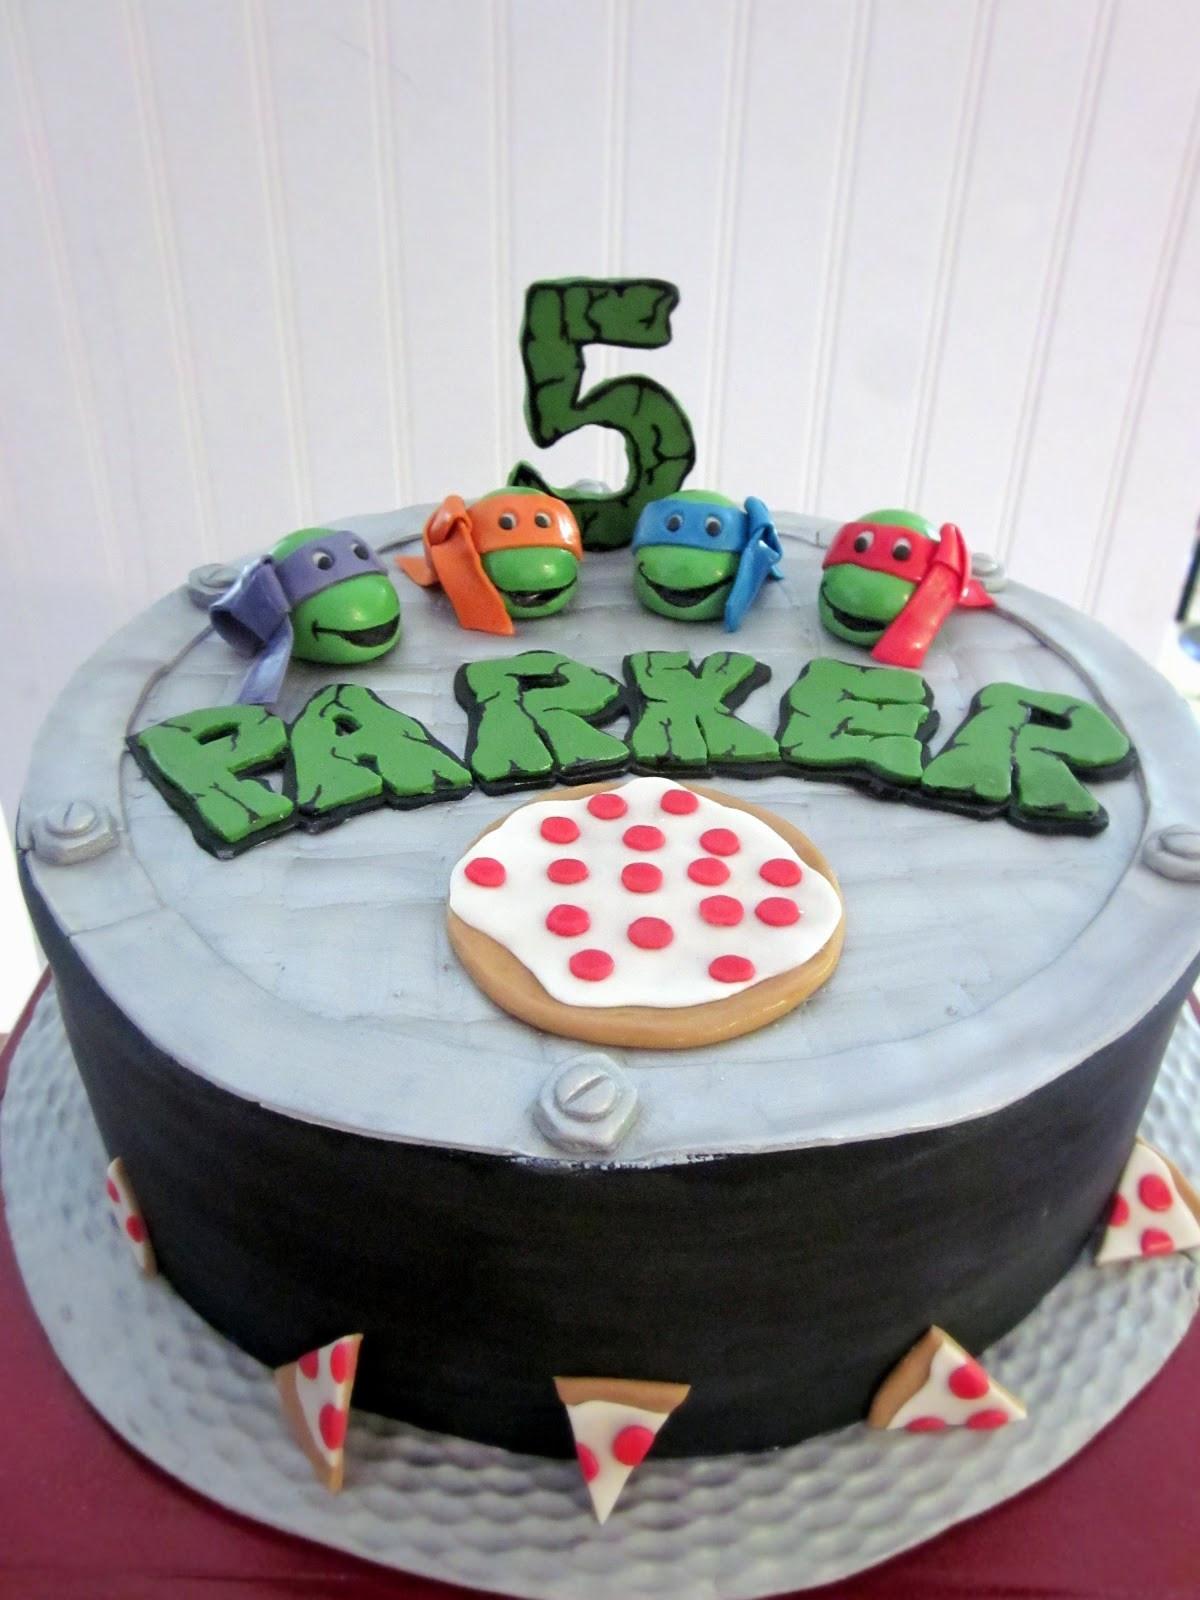 Best ideas about Turtle Birthday Cake . Save or Pin Darlin Designs Teenage Mutant Ninja Turtle Birthday Cake Now.